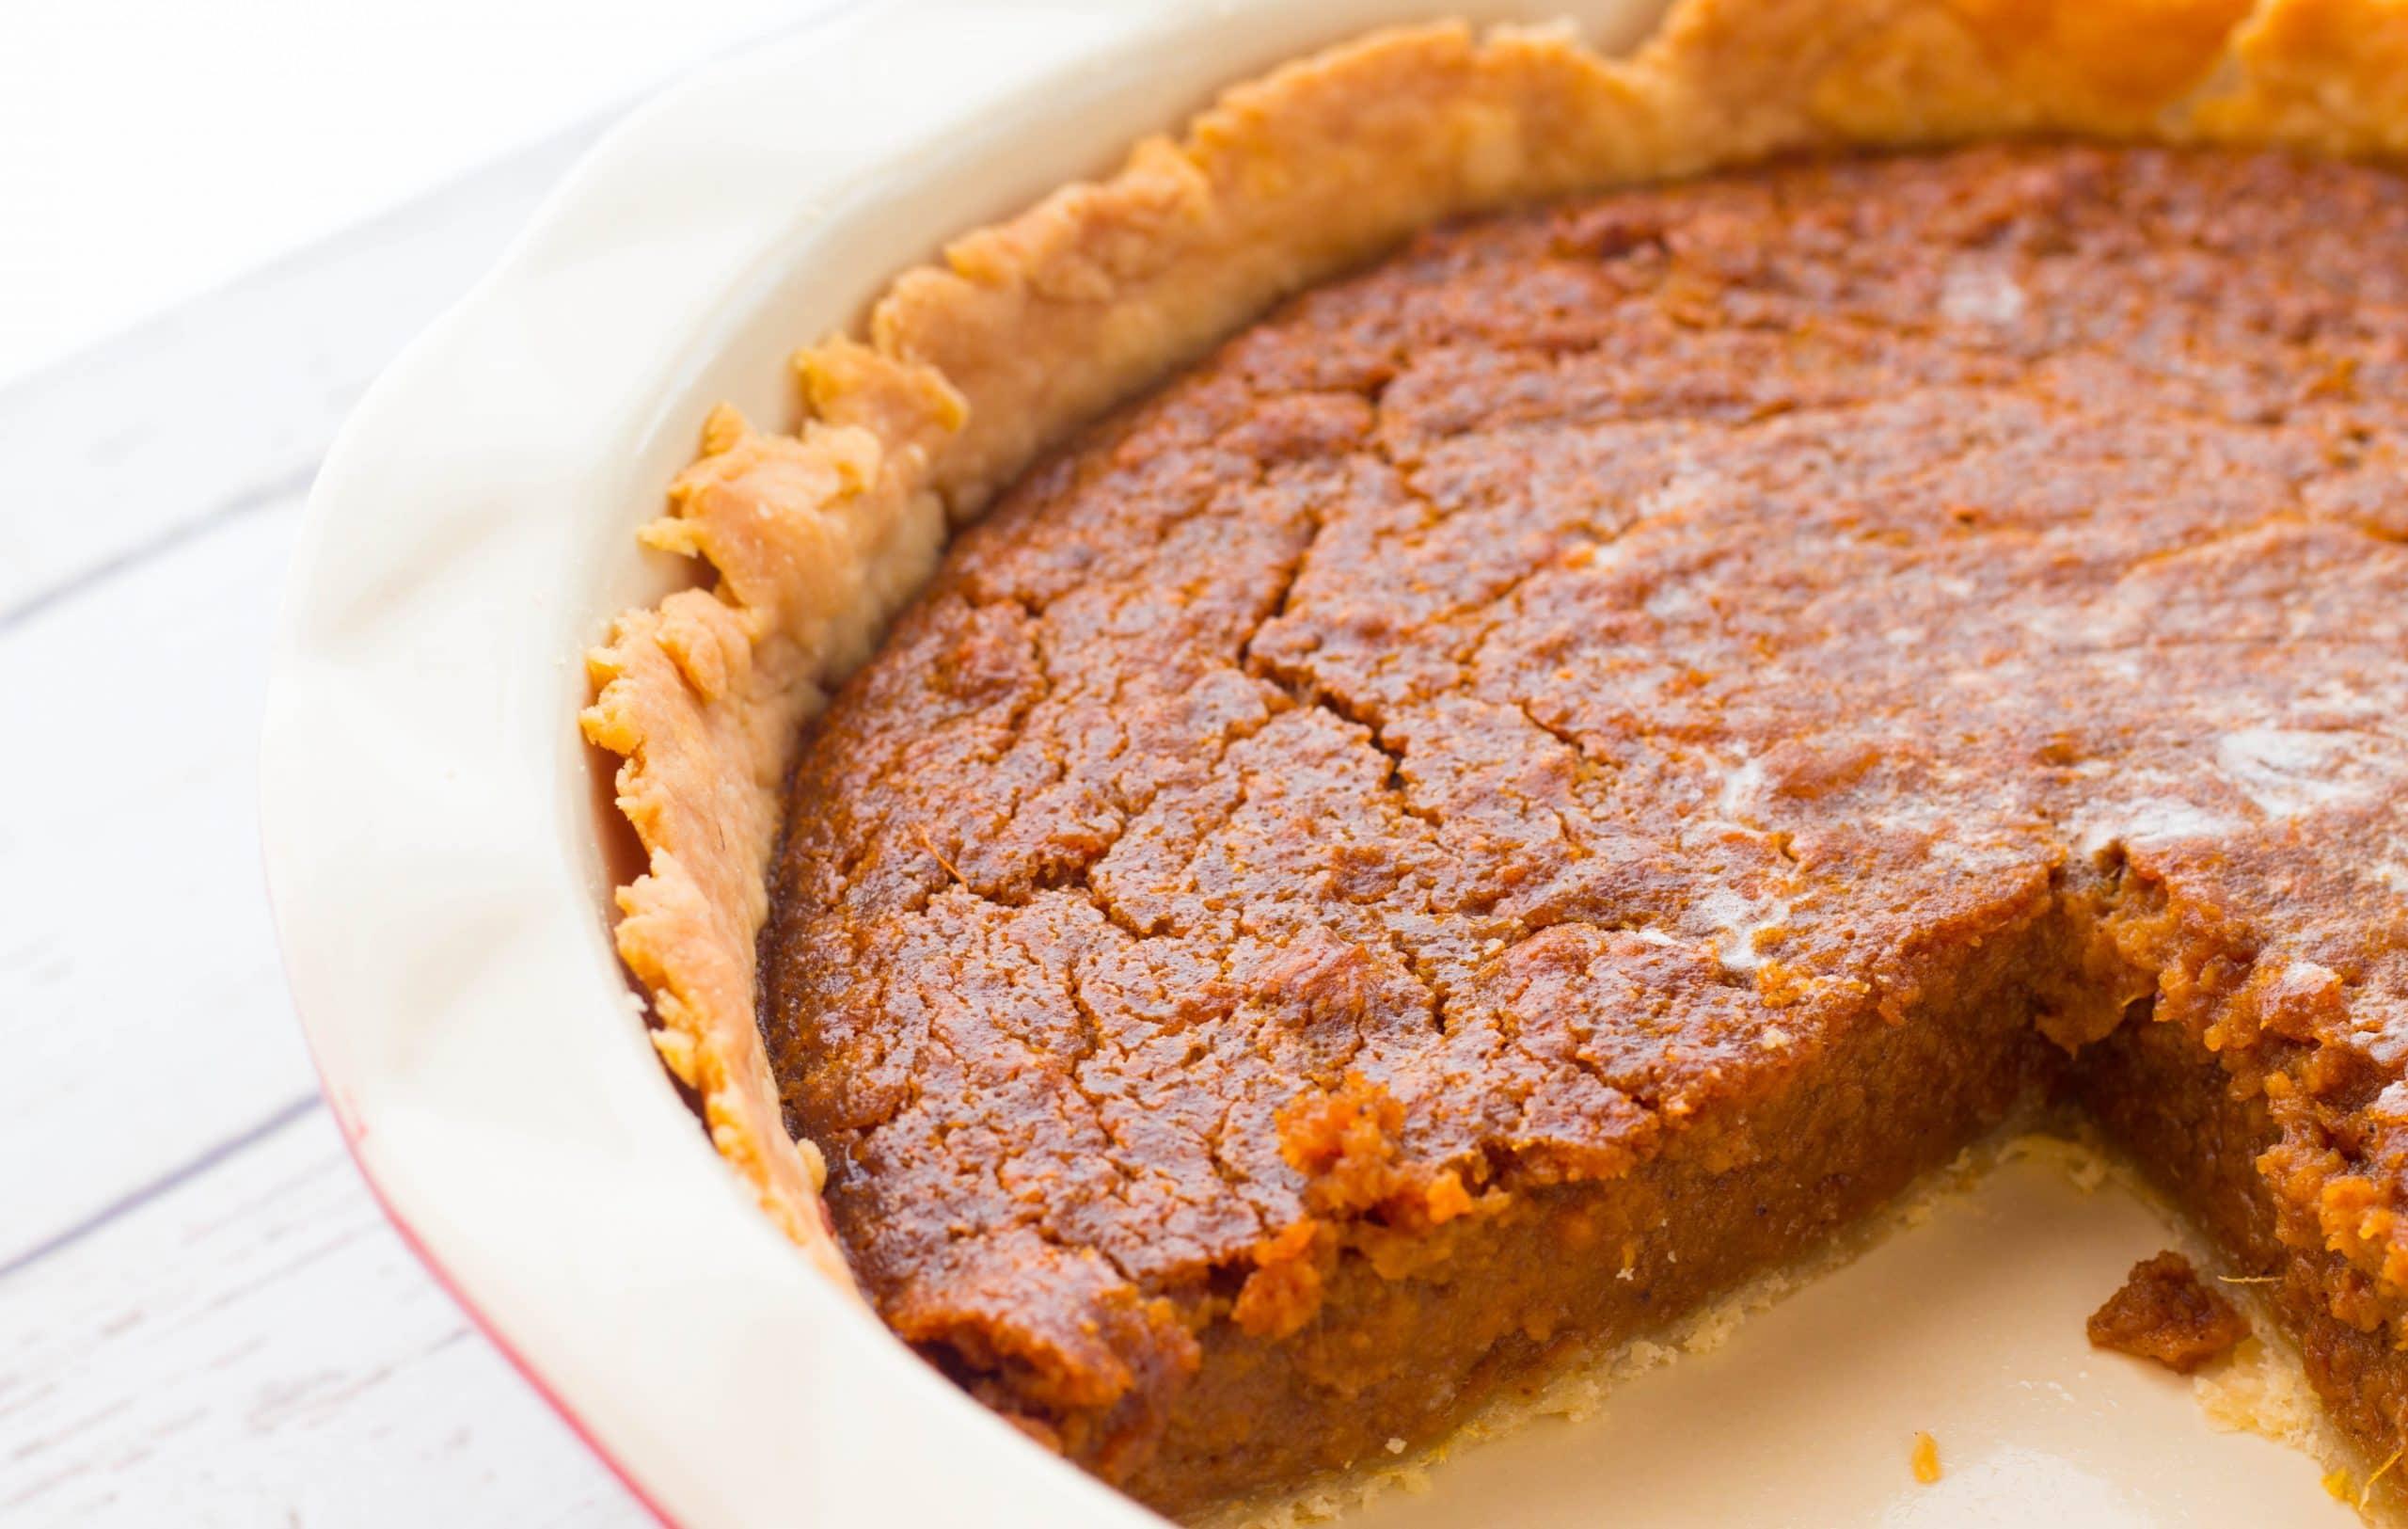 recipe for sweet potato pie from scratch